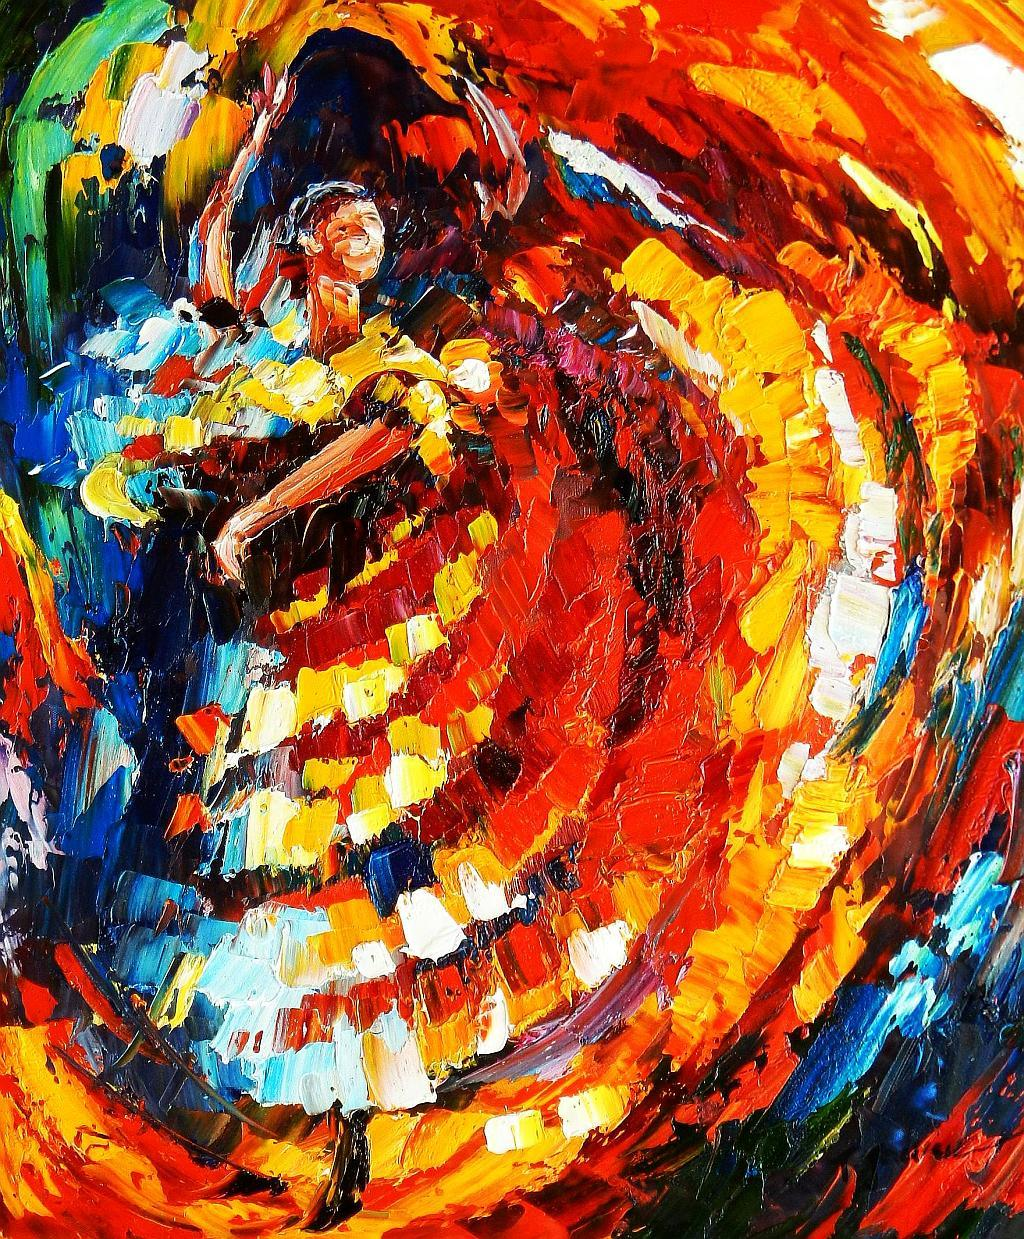 Modern Art - La Flamenco c93040 50x60cm stilvolles Ölgemälde